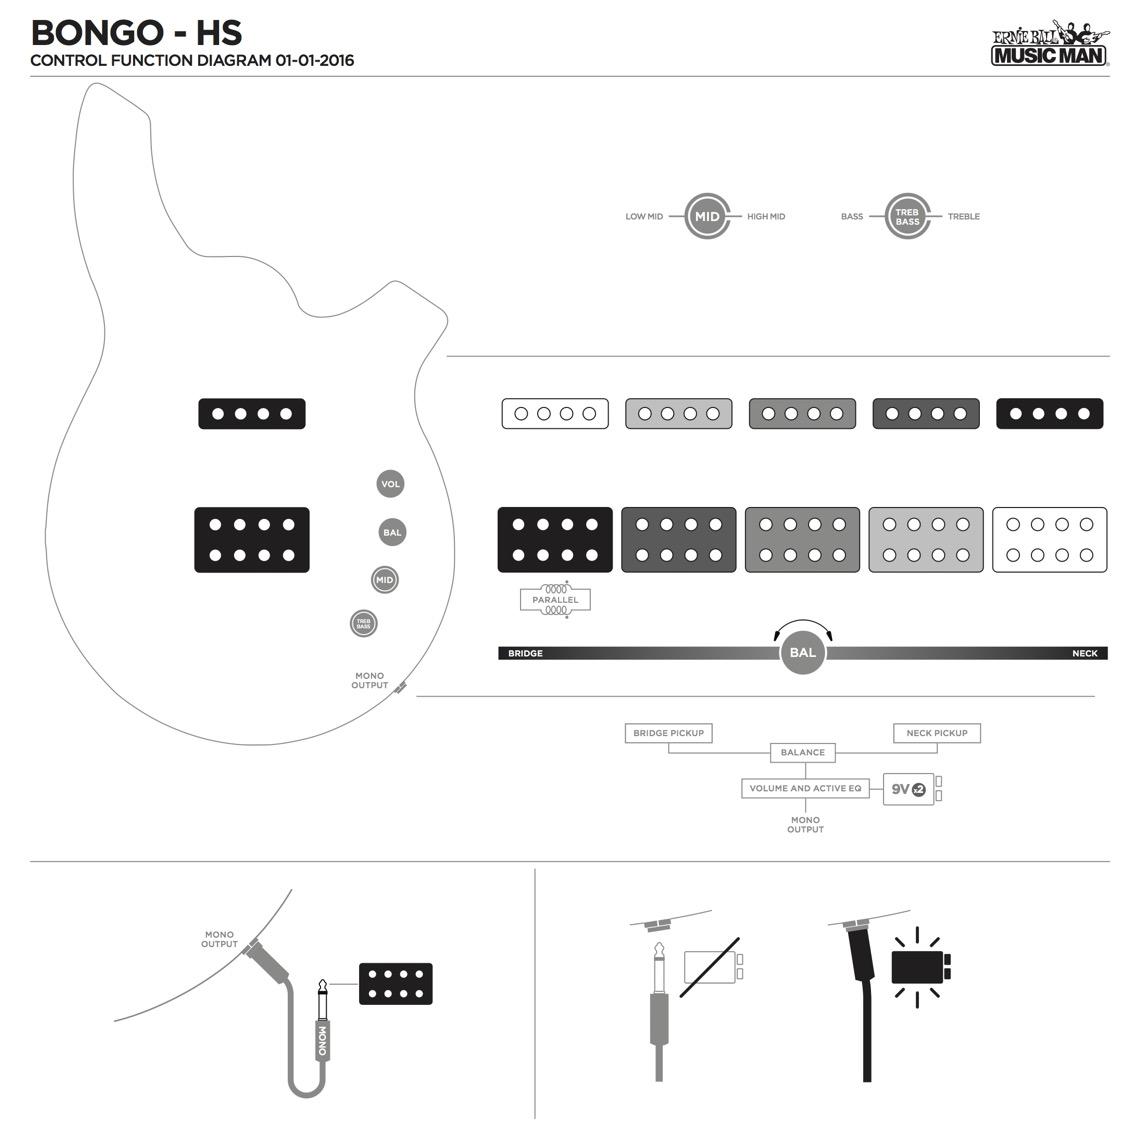 Active Bass Tone Controller Circuit Diagram